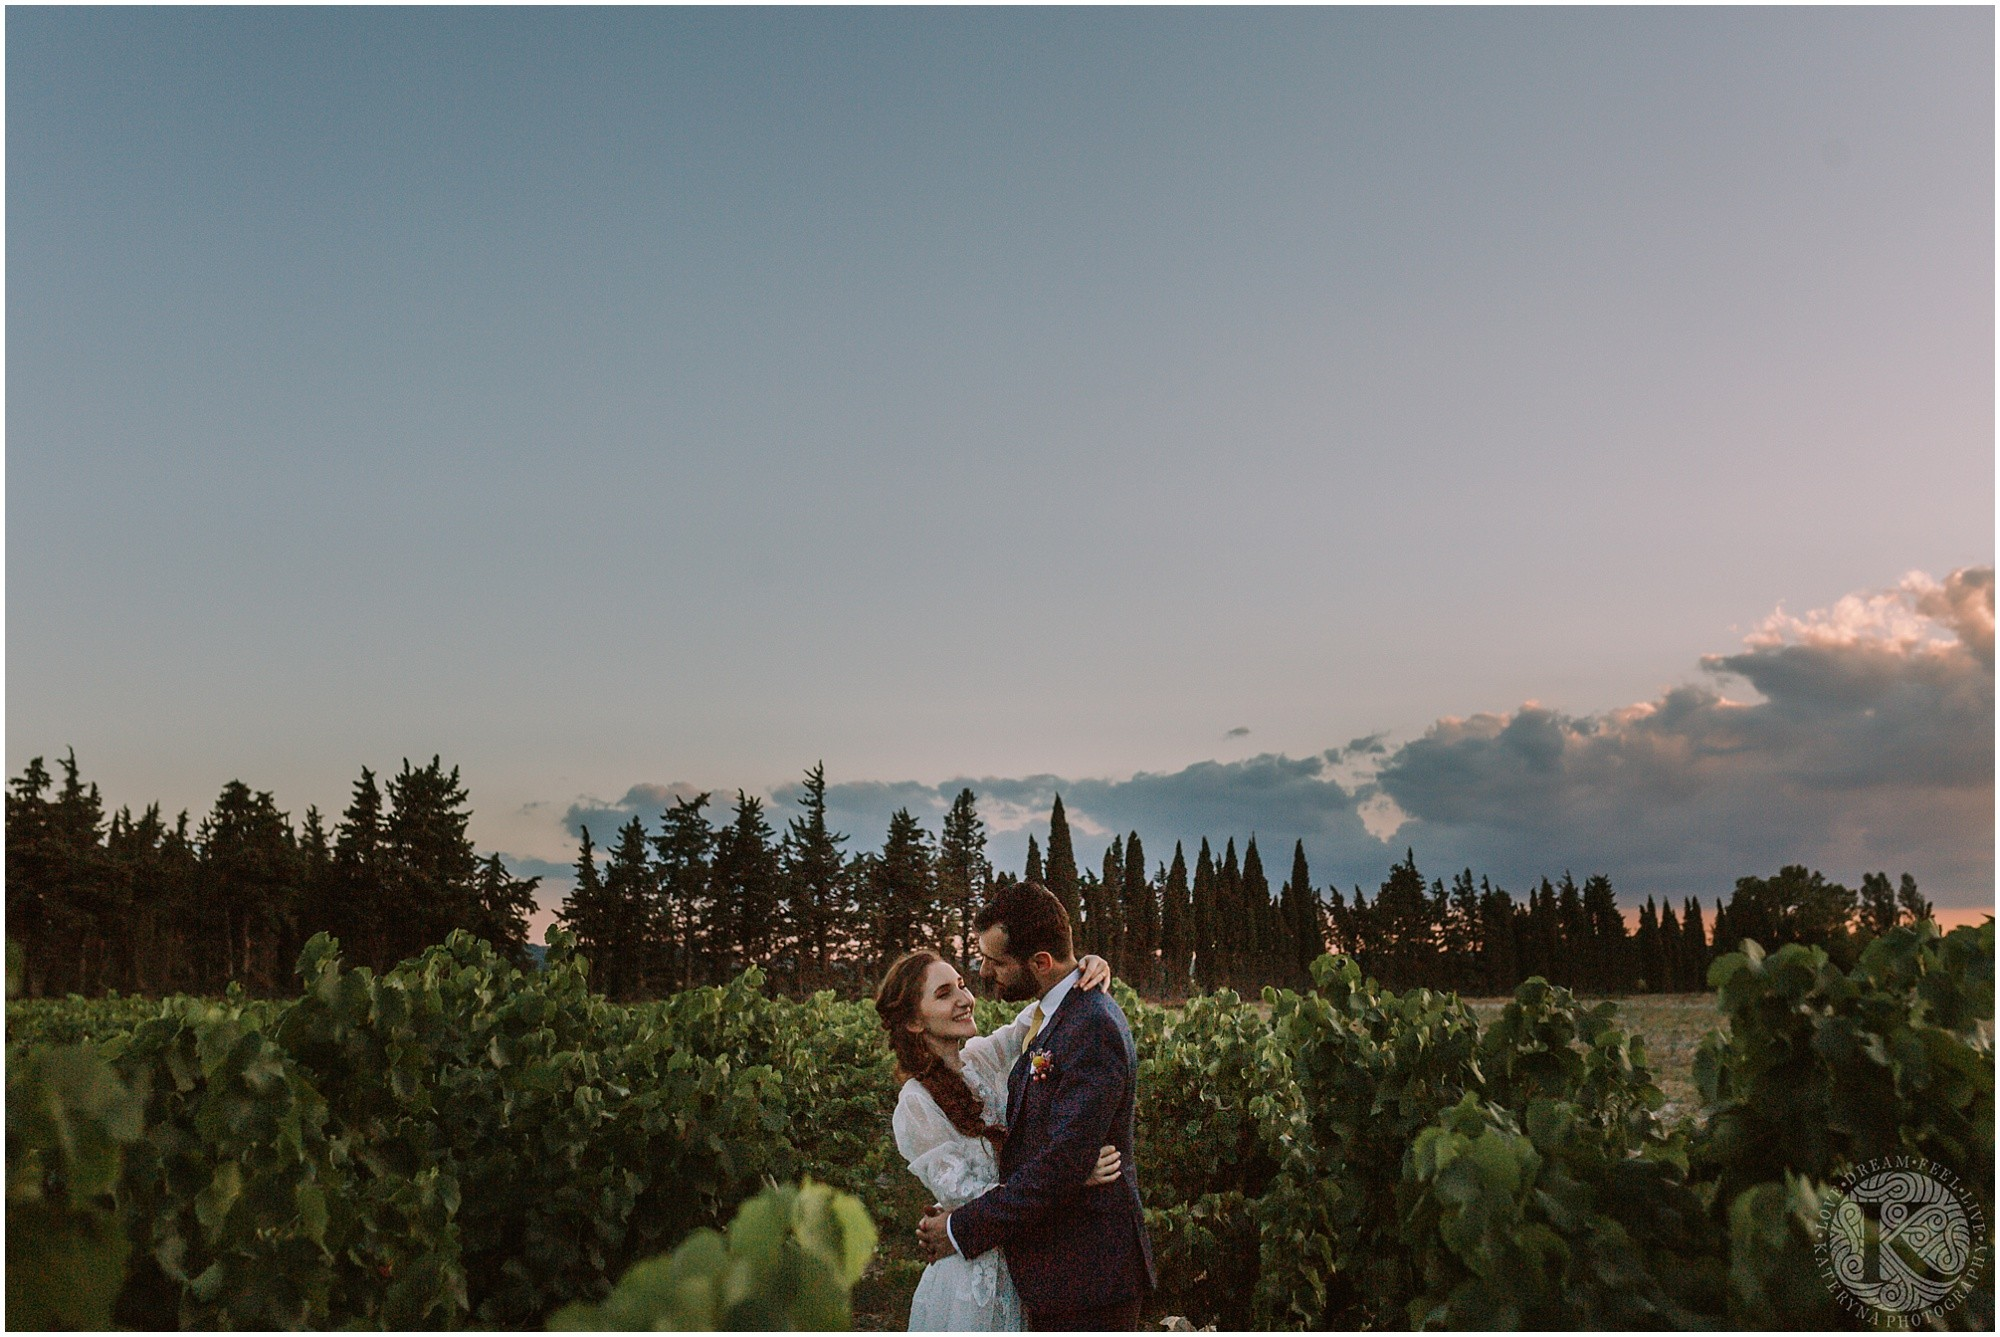 Kateryna-photos-photographe-mariage-vaucluse-provence-avignon-ferme-st-hugues_0075.jpg